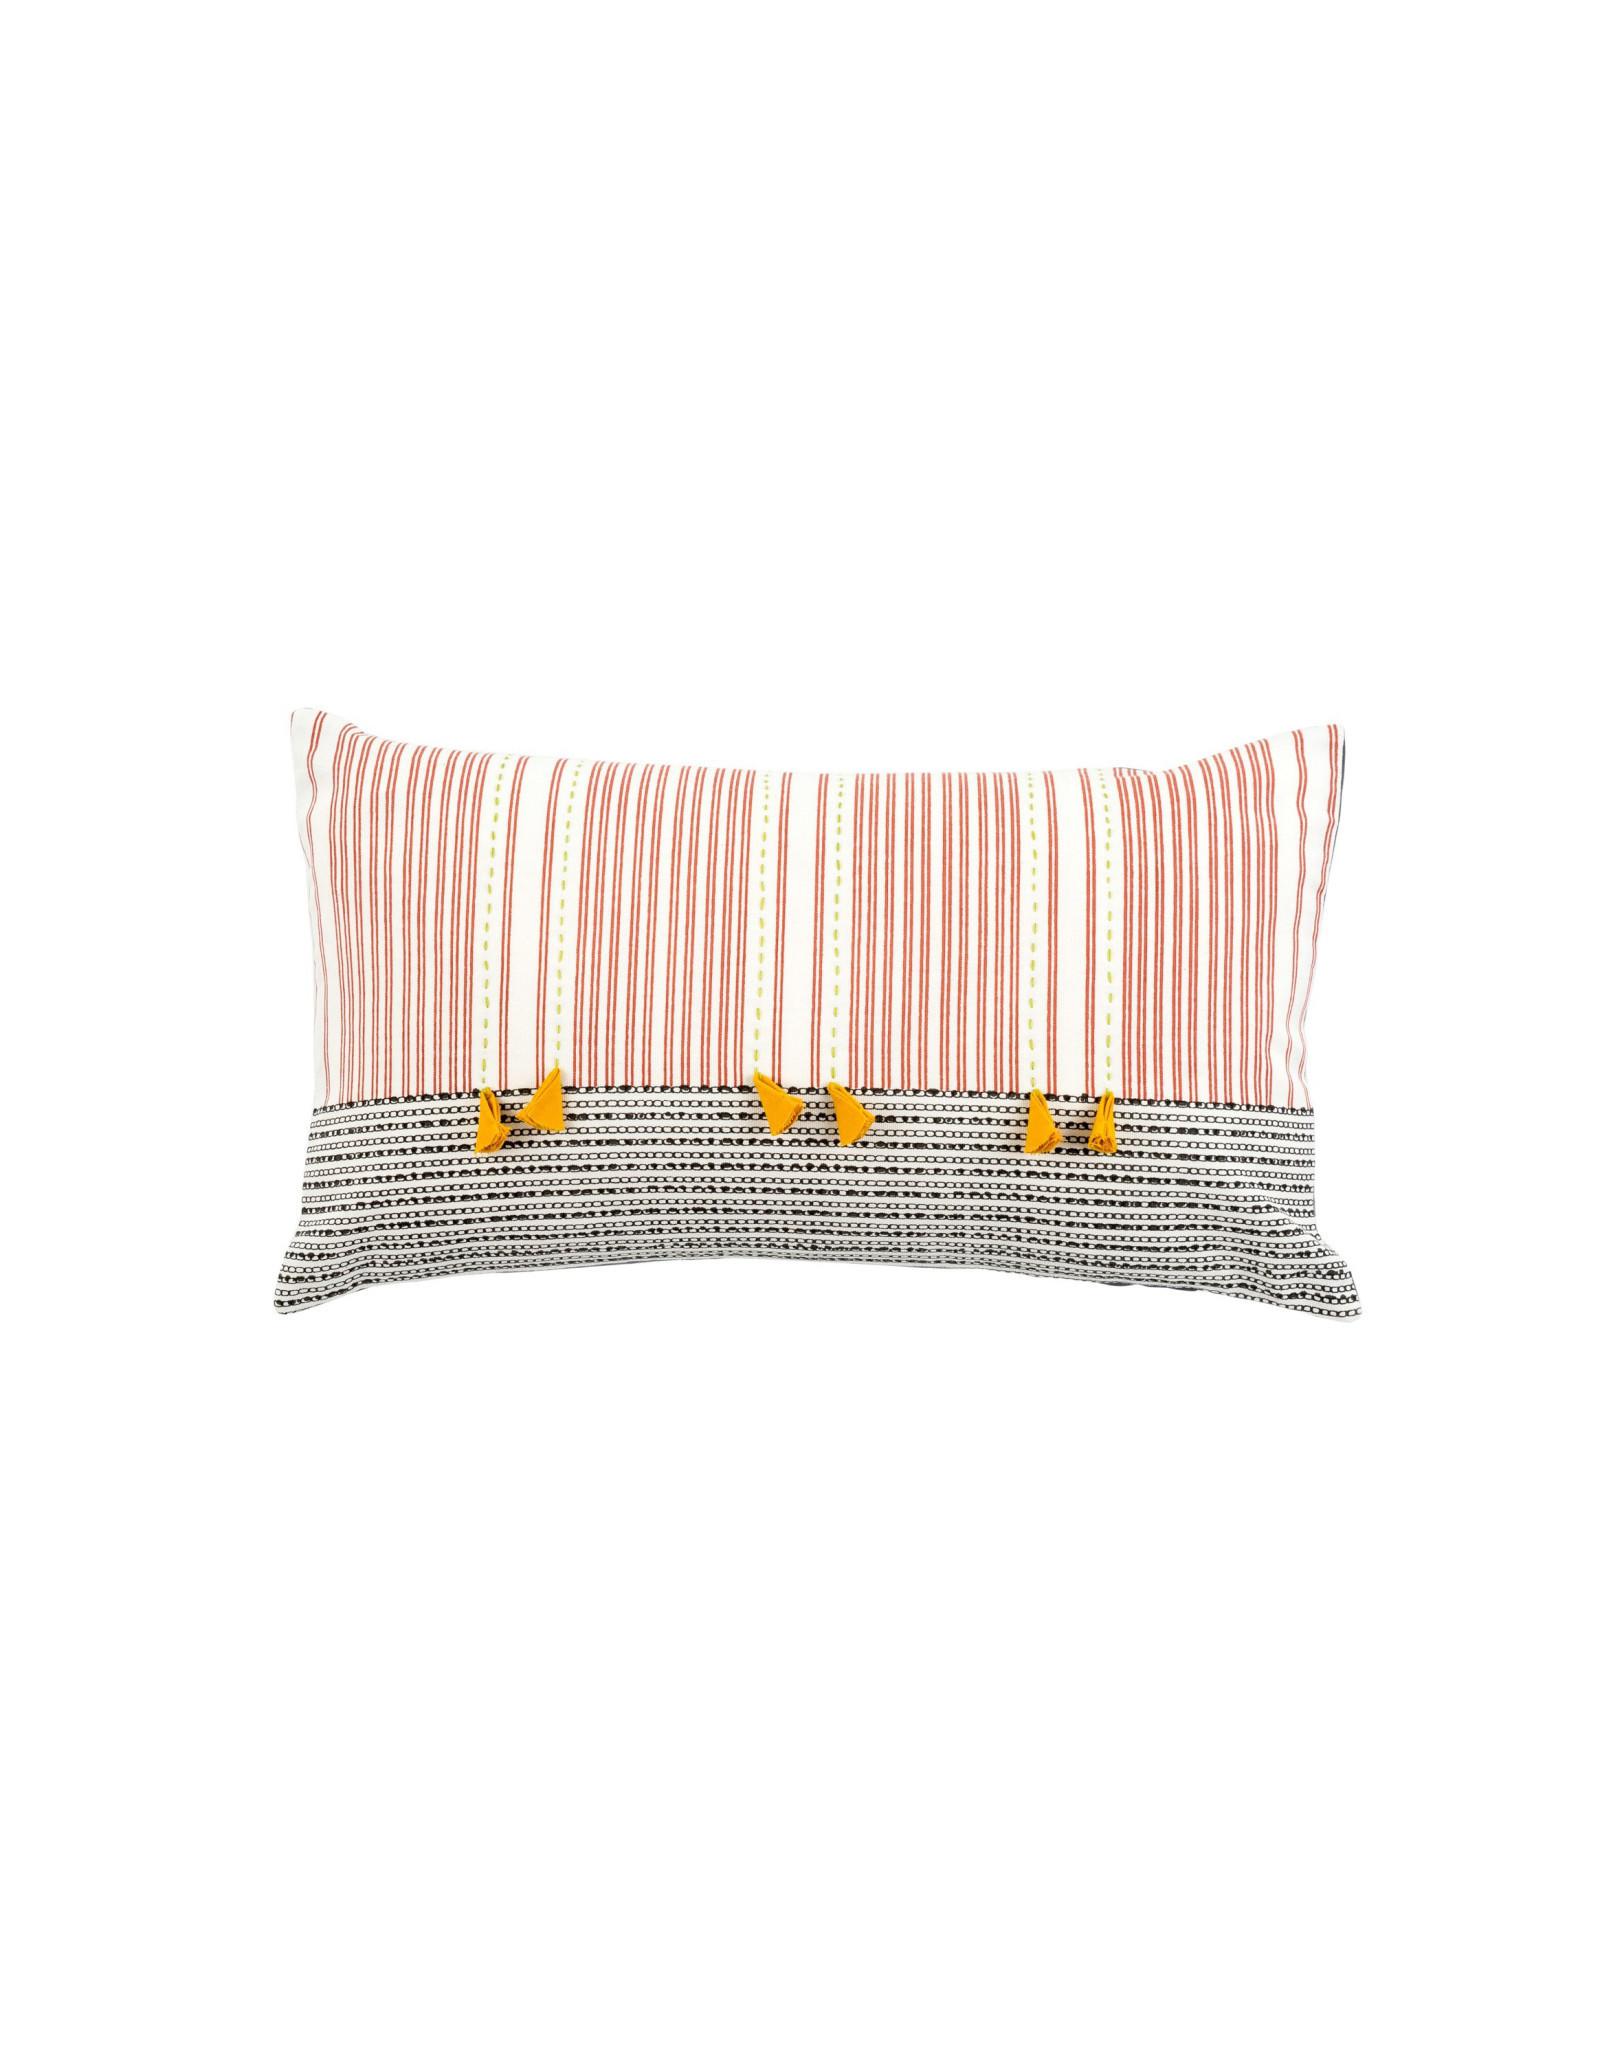 Indaba Kolkata Pillow - 6 Yellow Tassels